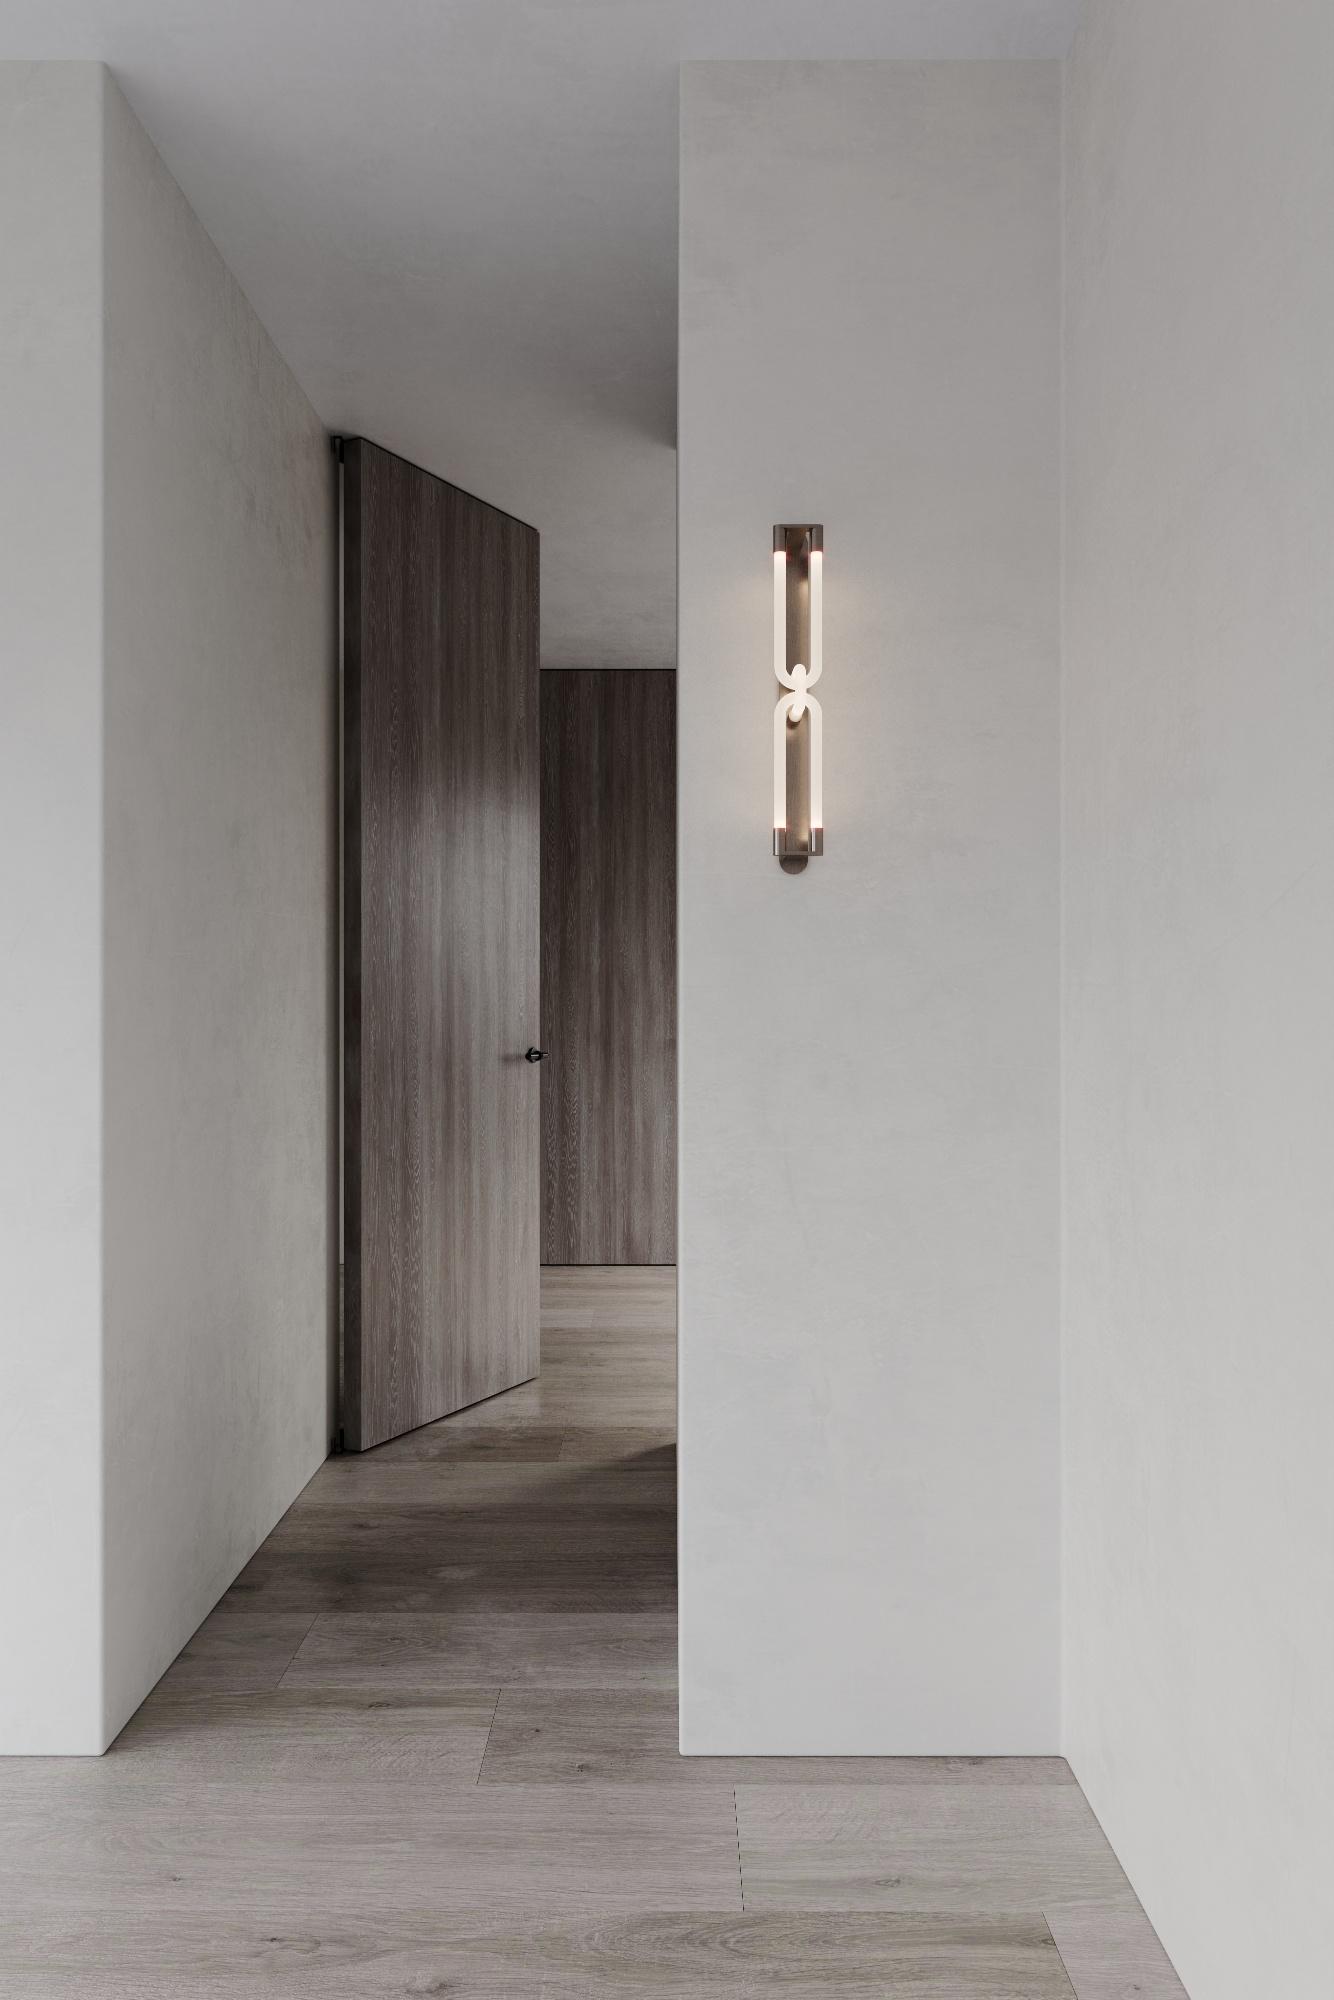 Corridor with Articolo lighting